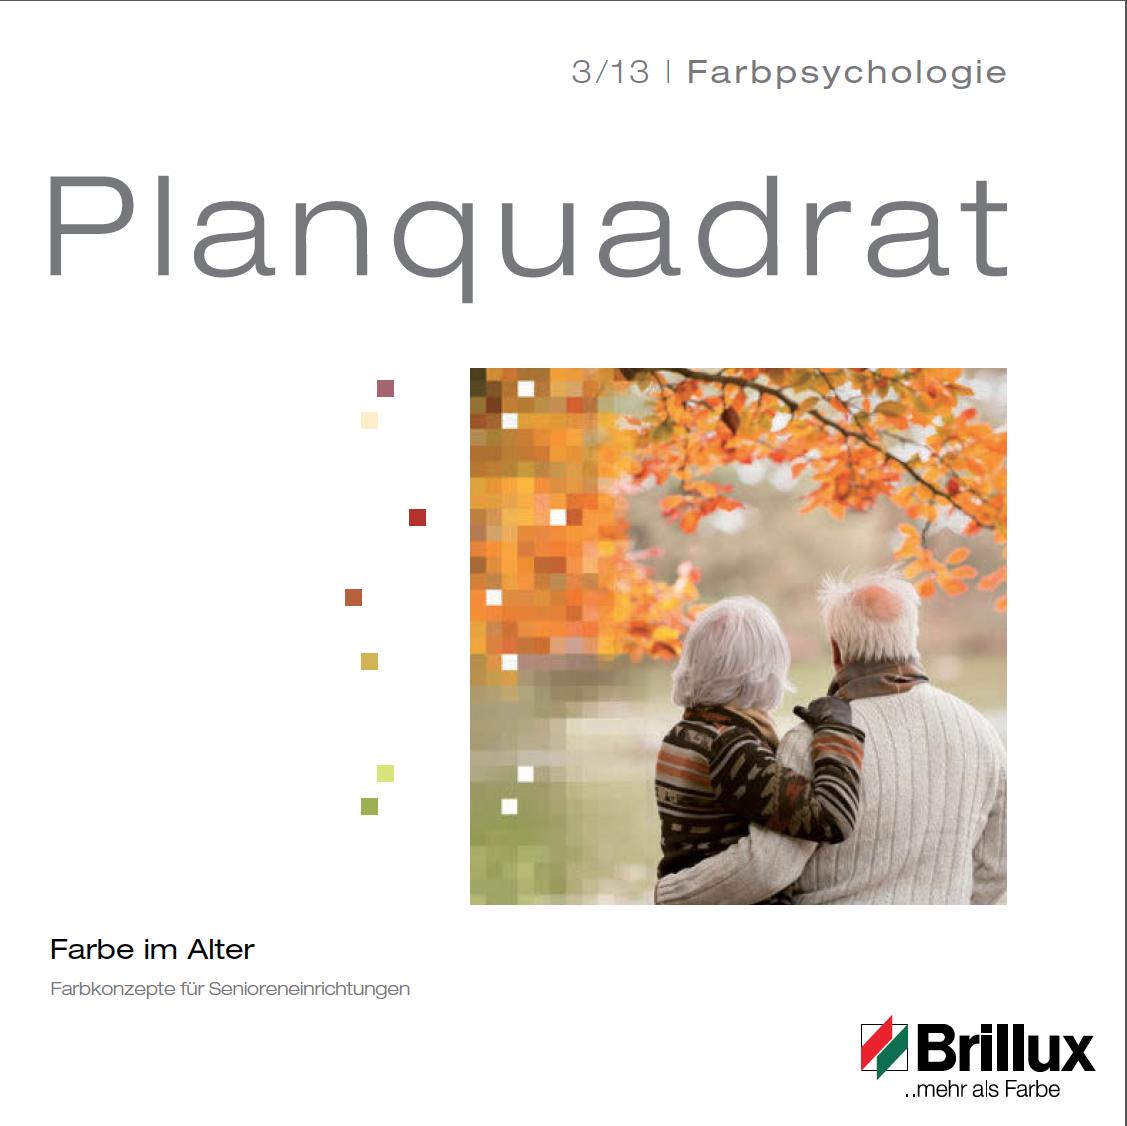 planquadrat_03_13